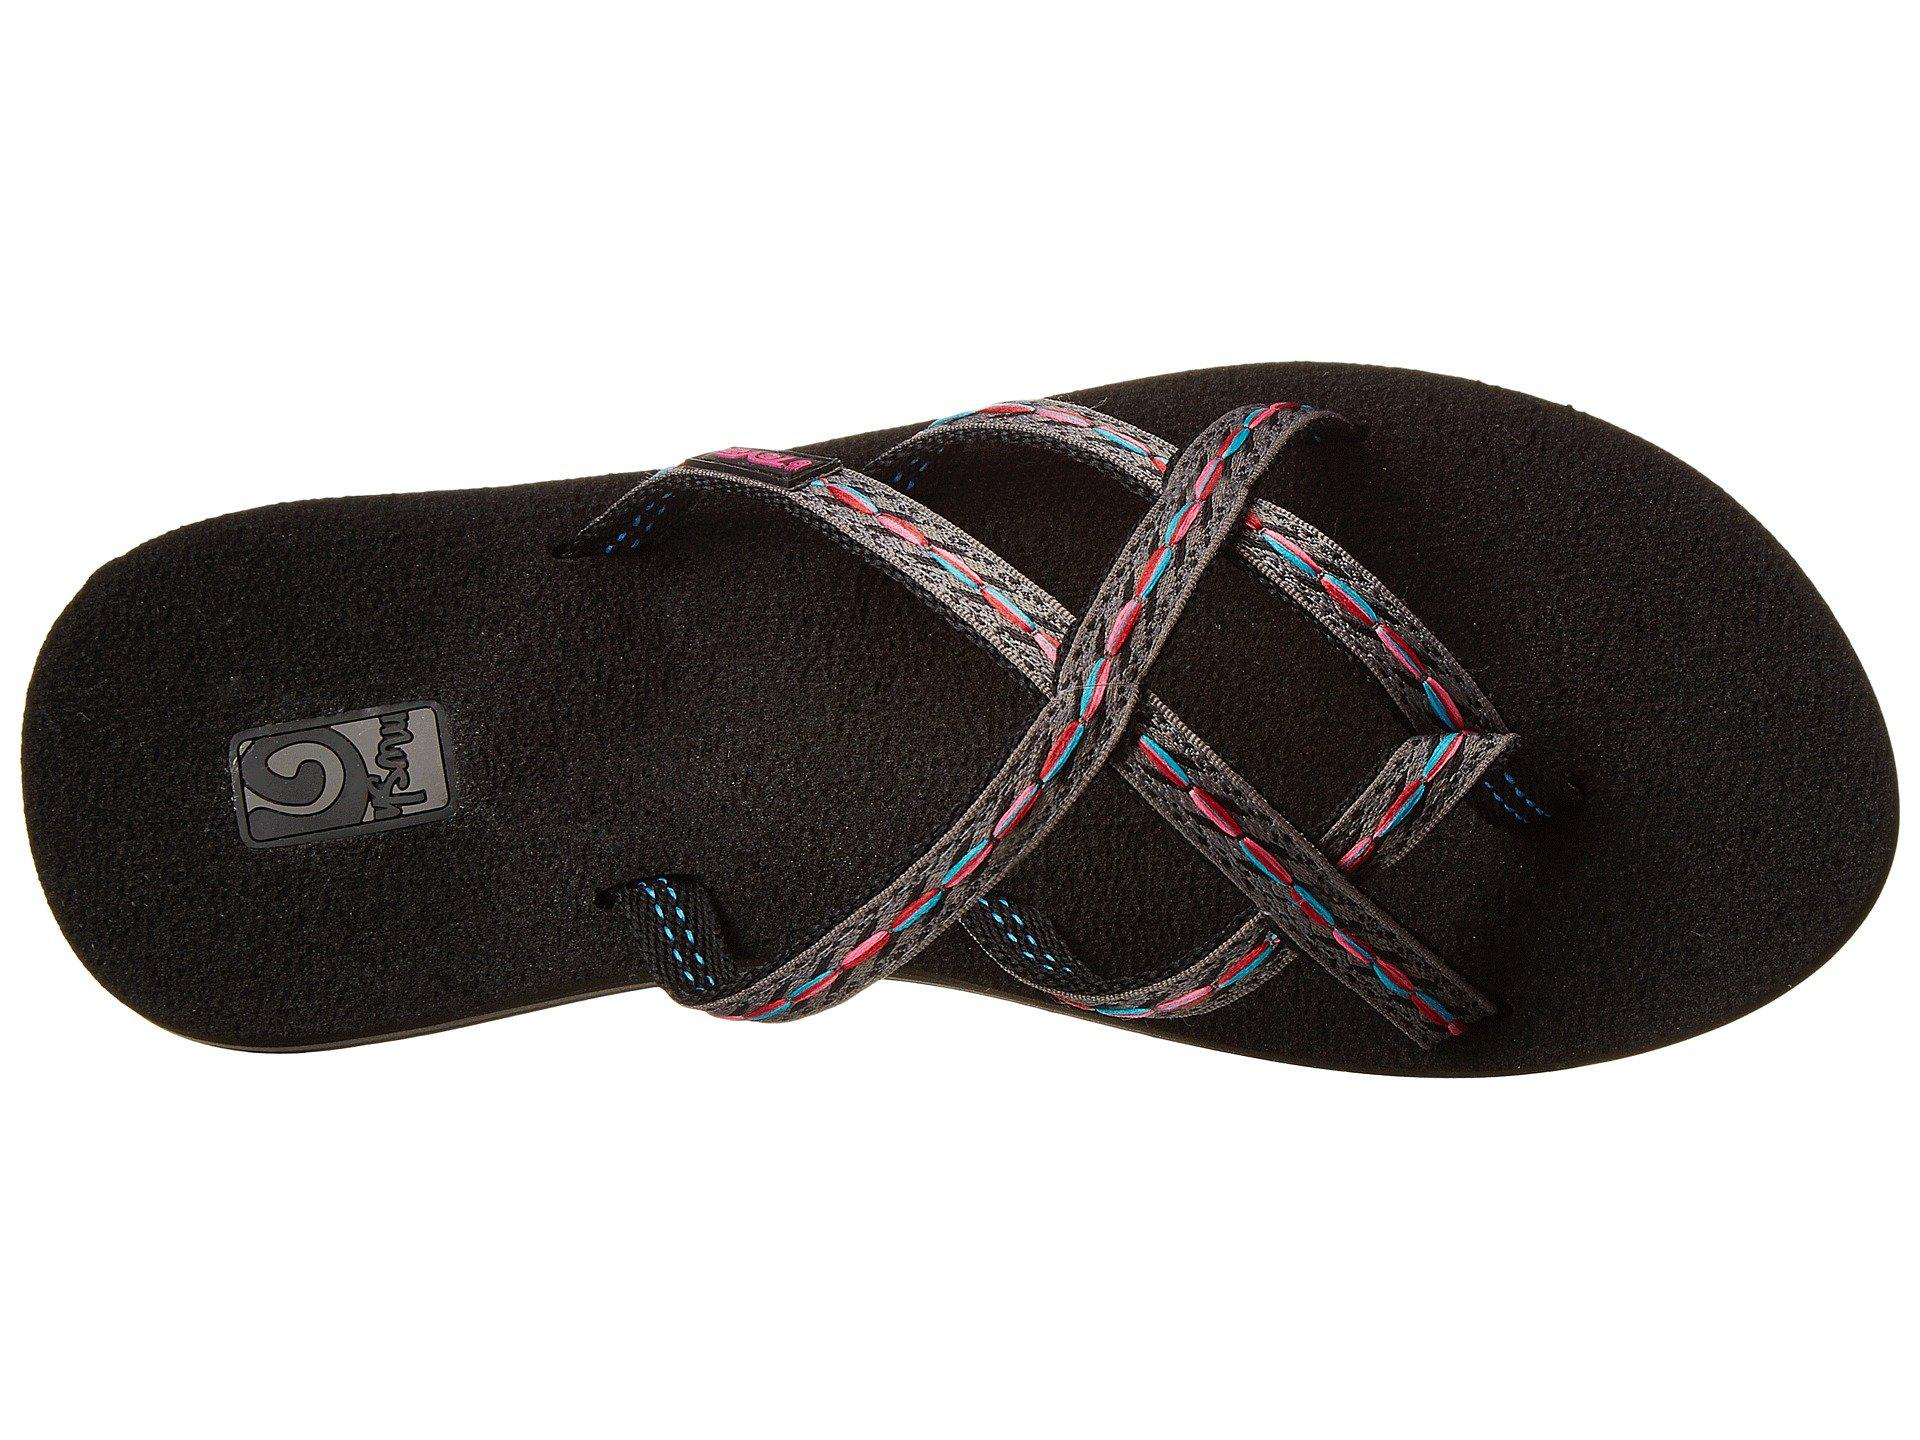 a644004227e014 Lyst - Teva Olowahu 2-pack (mibob felicitas Black) Women s Sandals ...